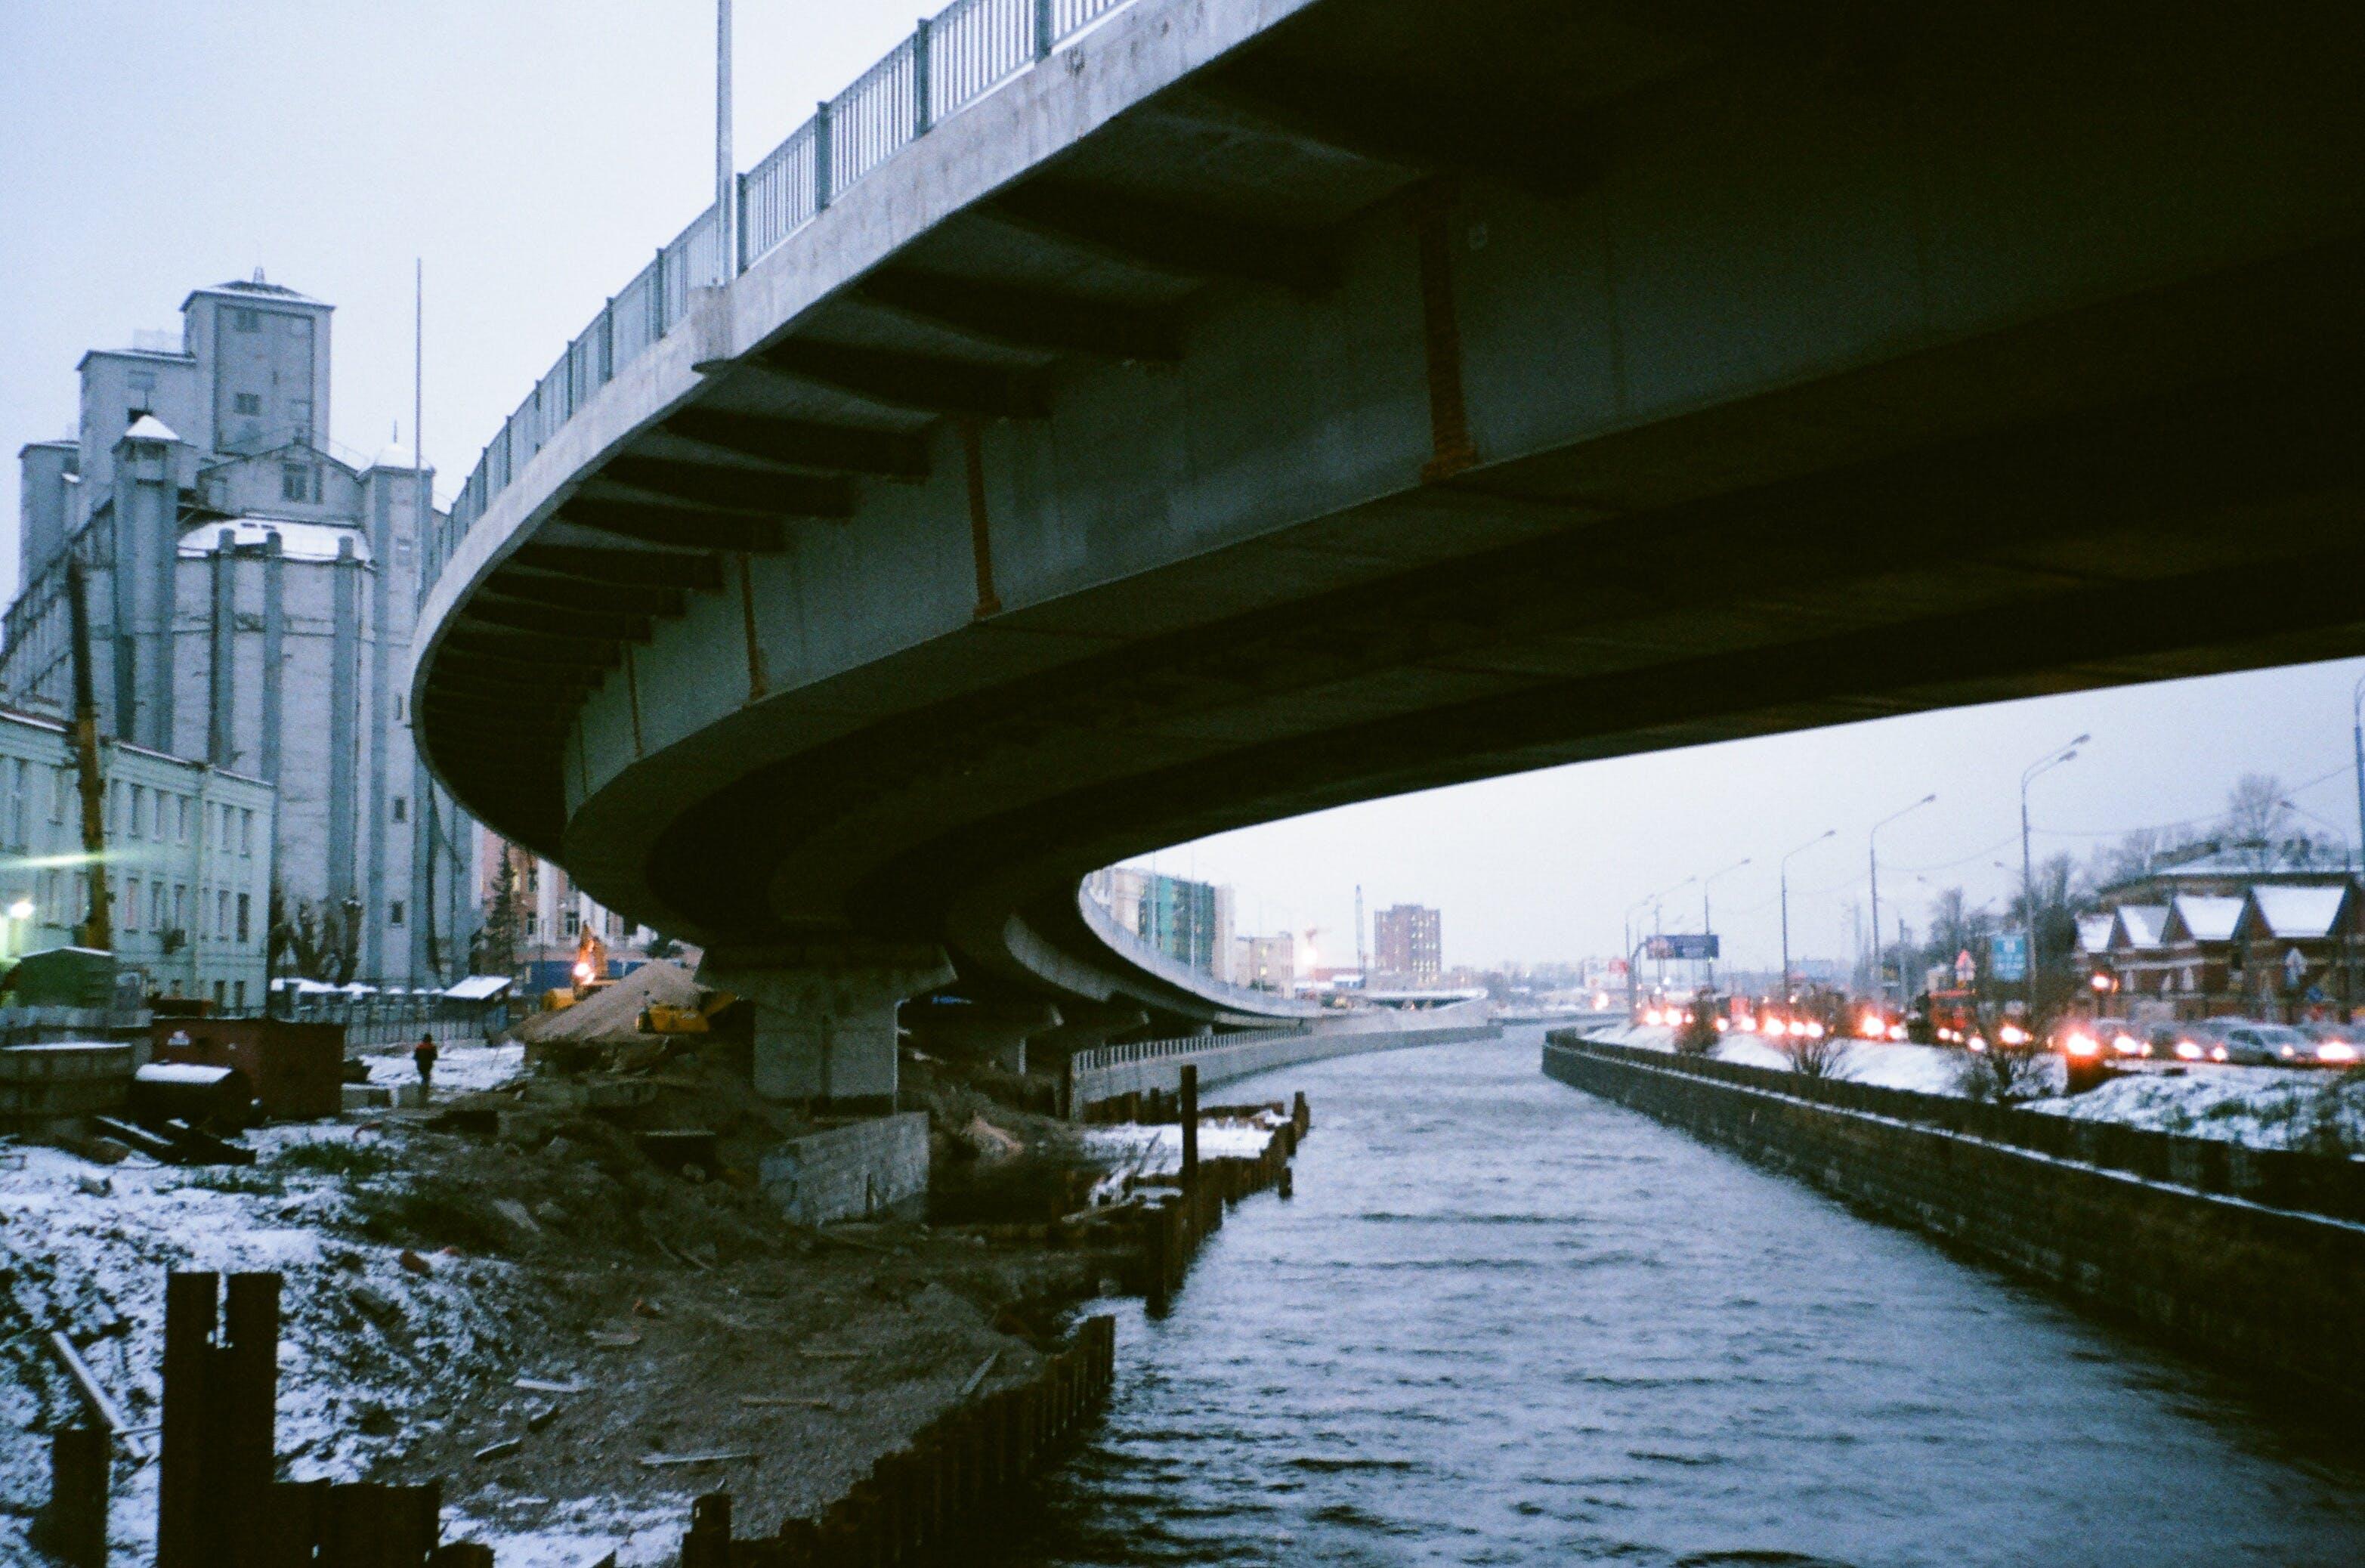 Architectural Photograph of a Bridge